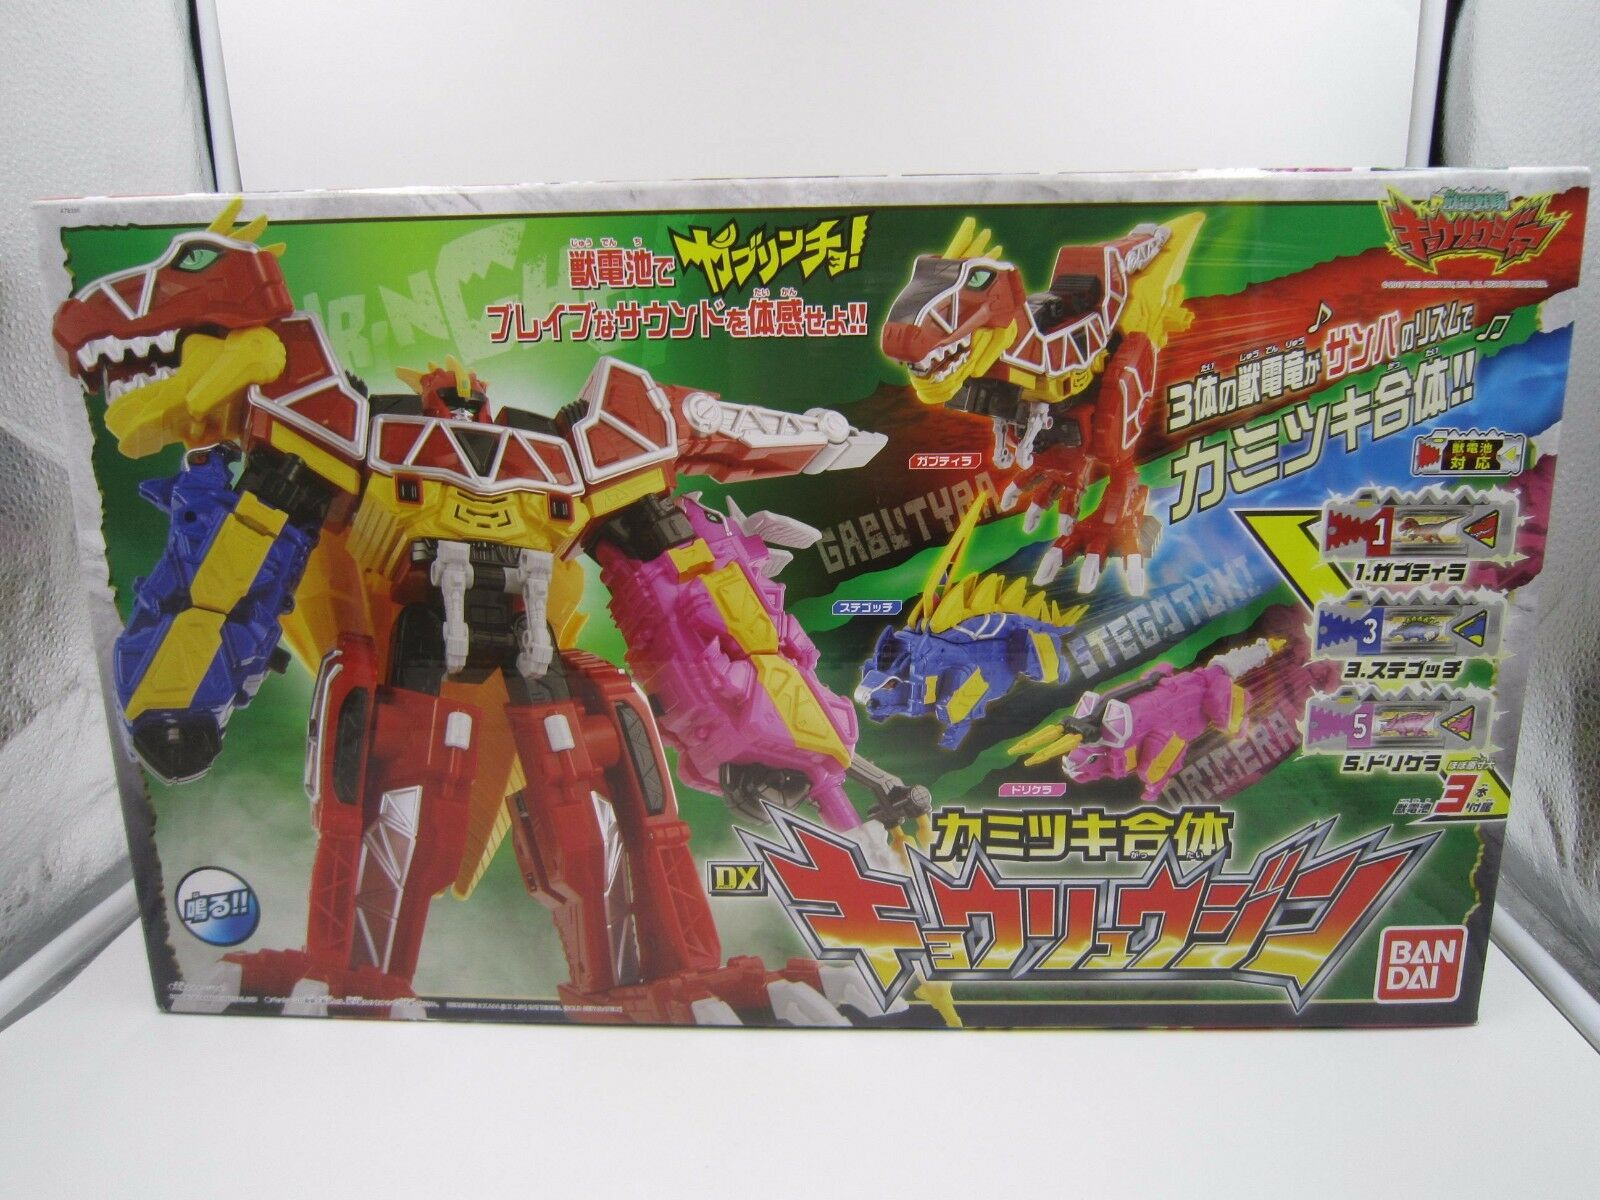 Power Ranger Zyuden Sentai Kyoryuger Dino Charge DX Kyoryujin 1600x1200